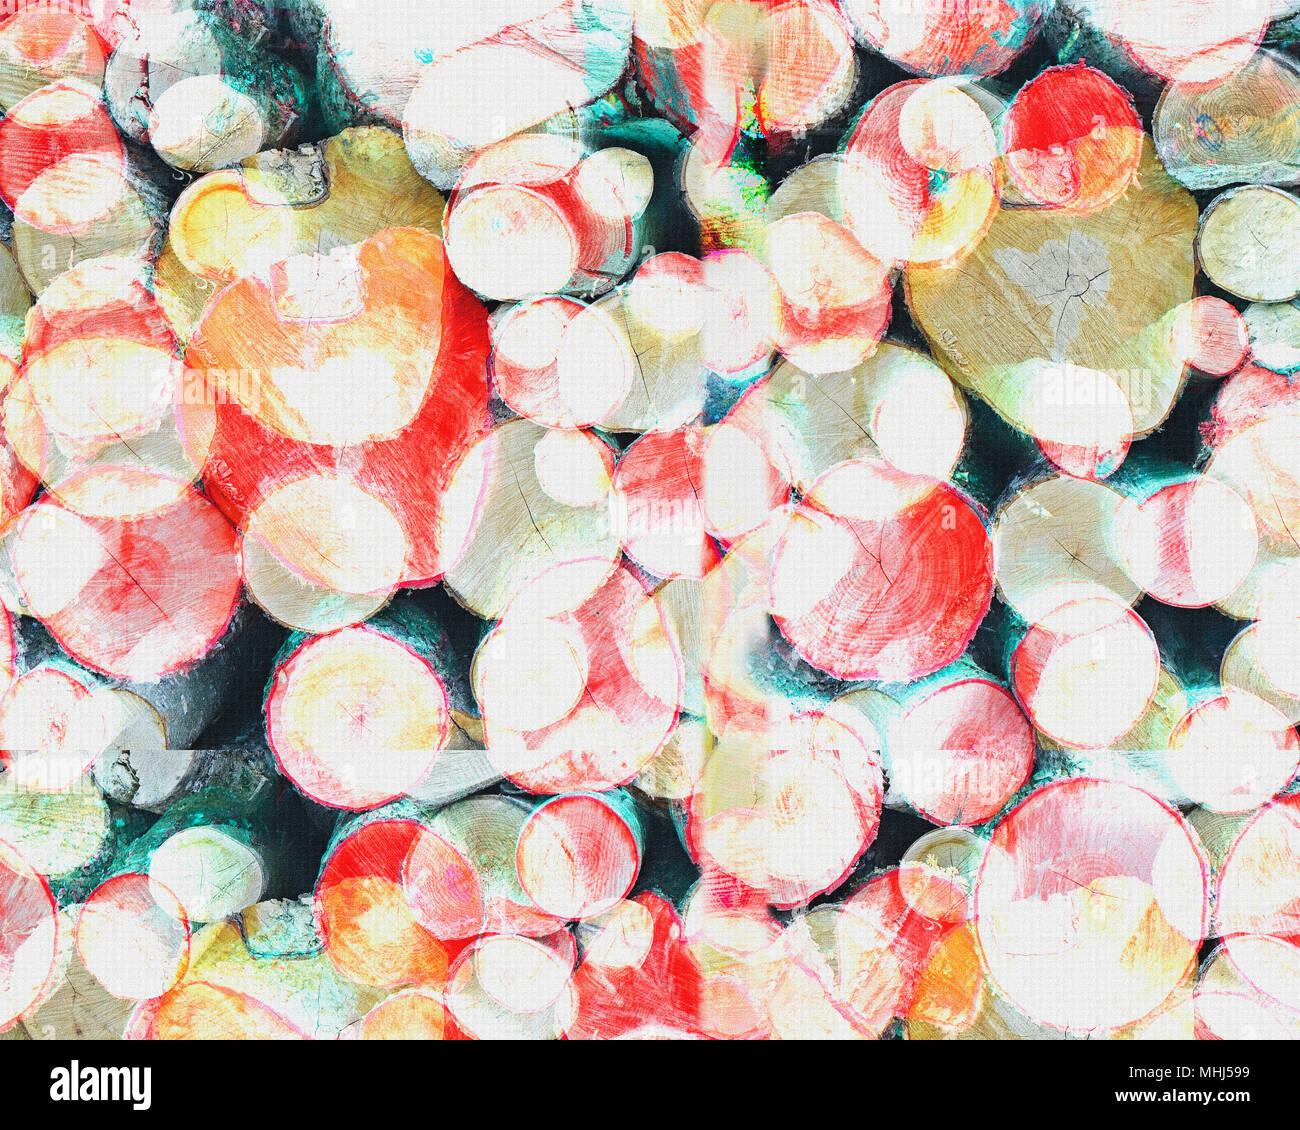 DIGITAL ART: Forest Pile - Stock Image